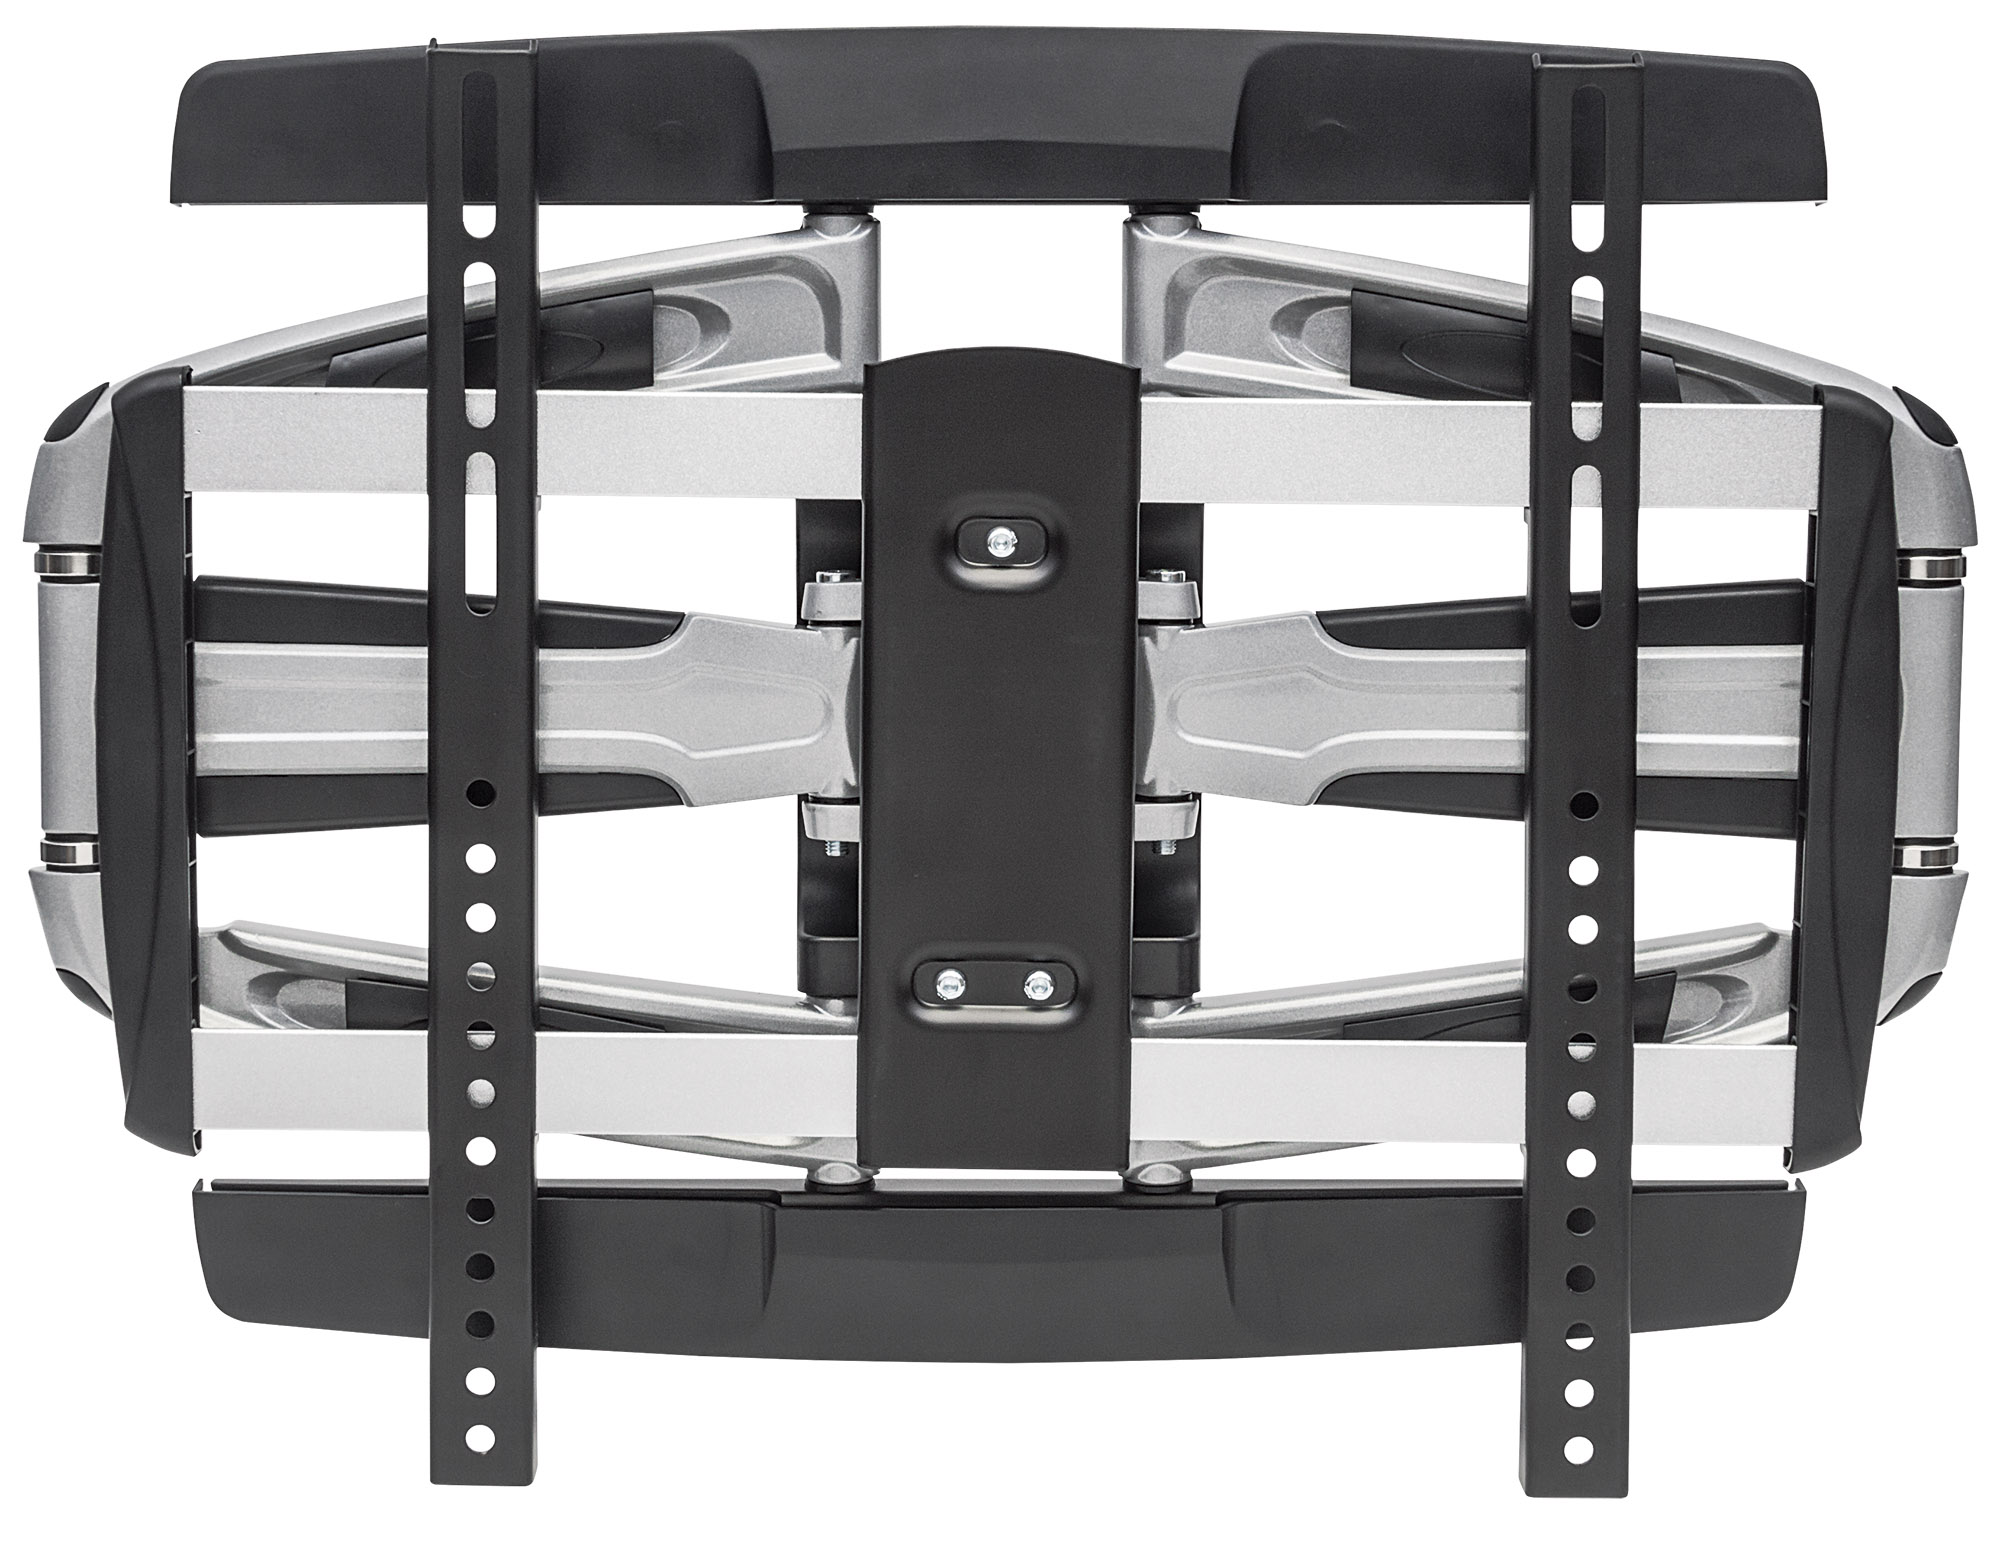 Universal Aluminum LCD Full-Motion Wall Mount